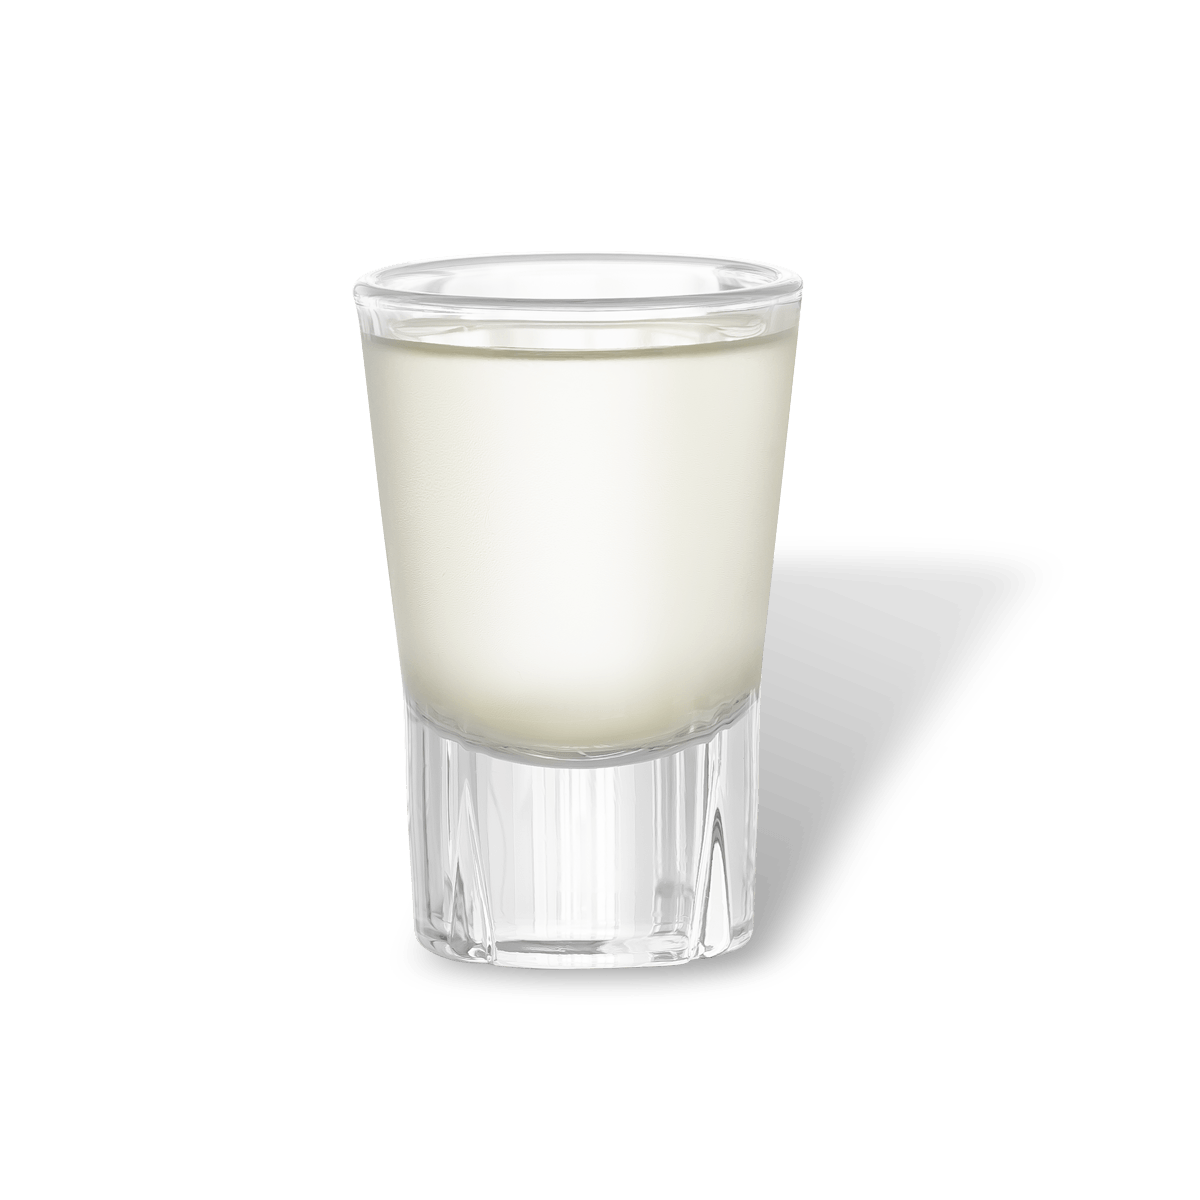 Rosendahl - Grand Cru Shot Glass - 6 pack (25357)